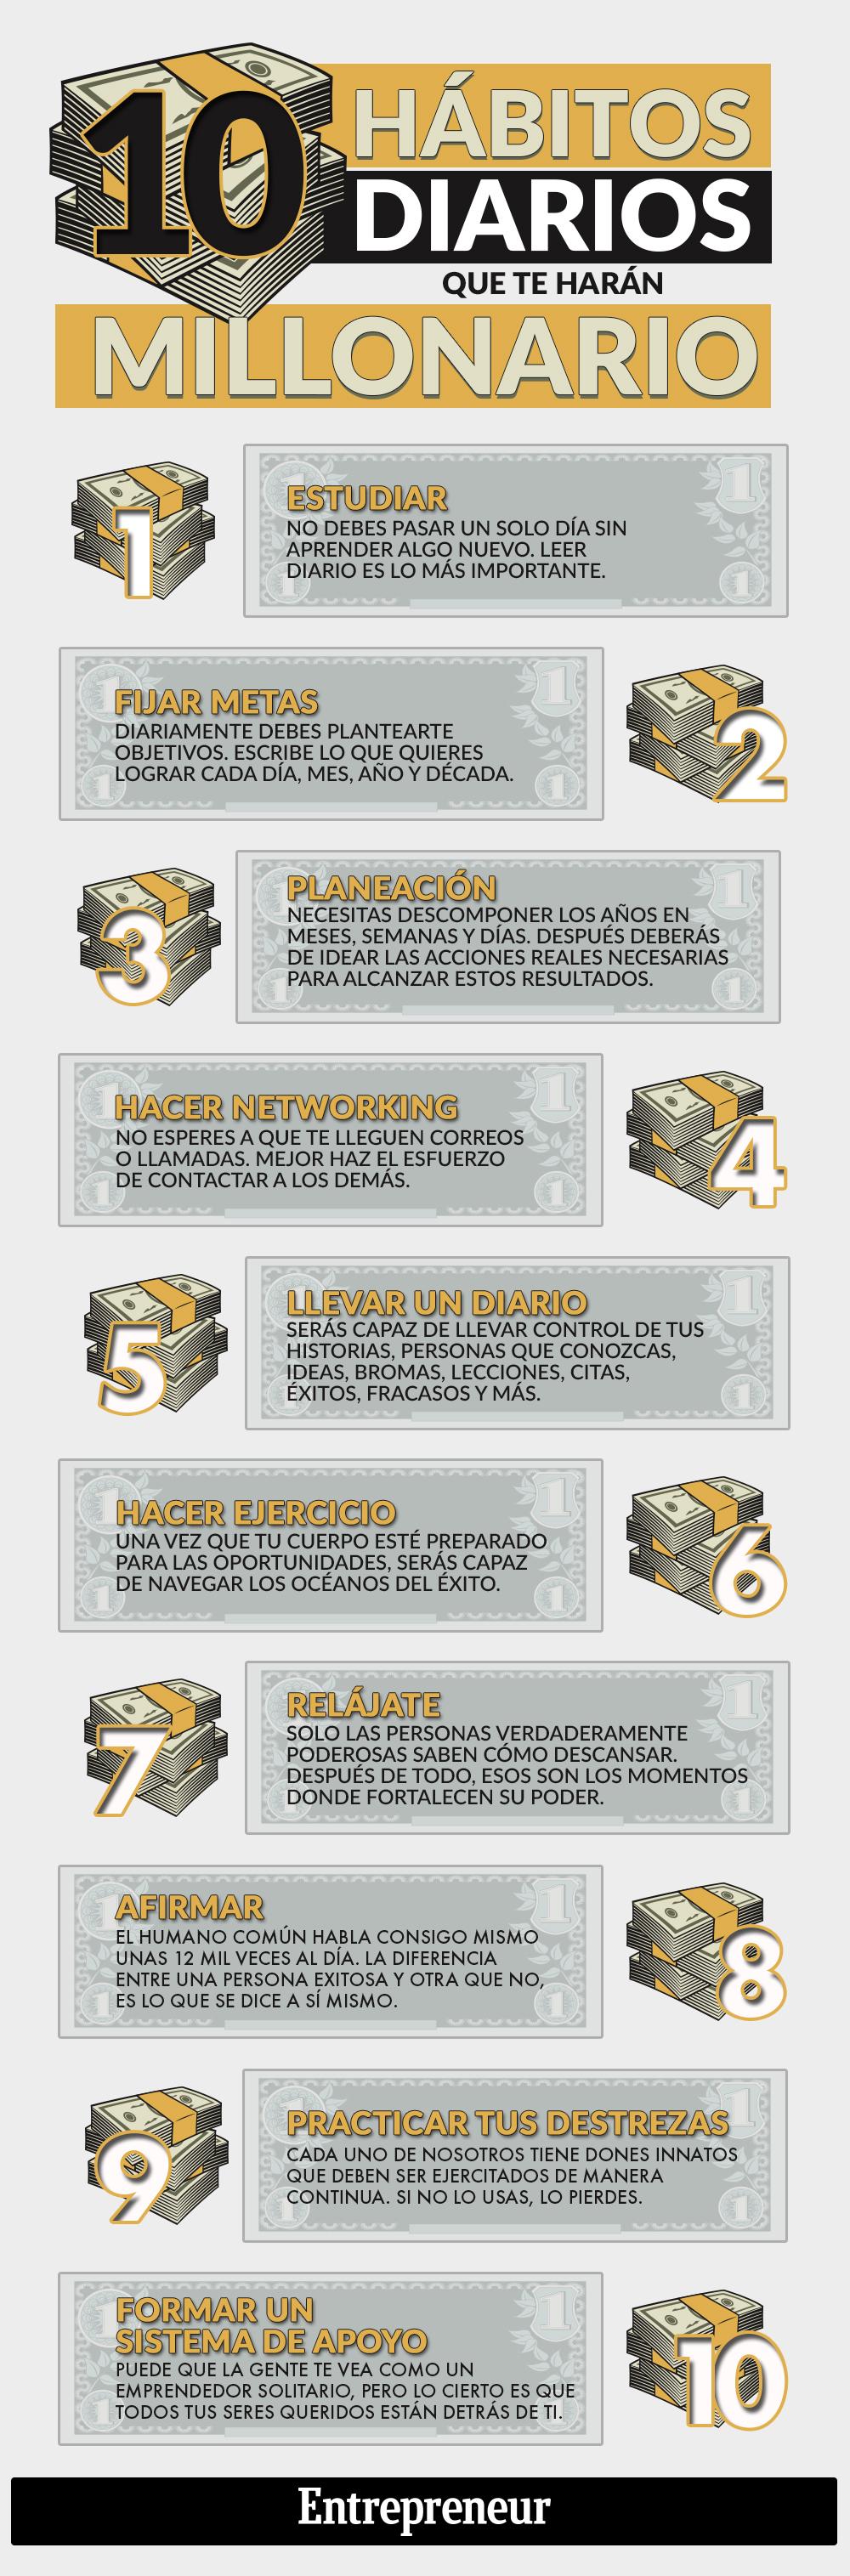 10-habitos-que-te-haran-millonario-infografia